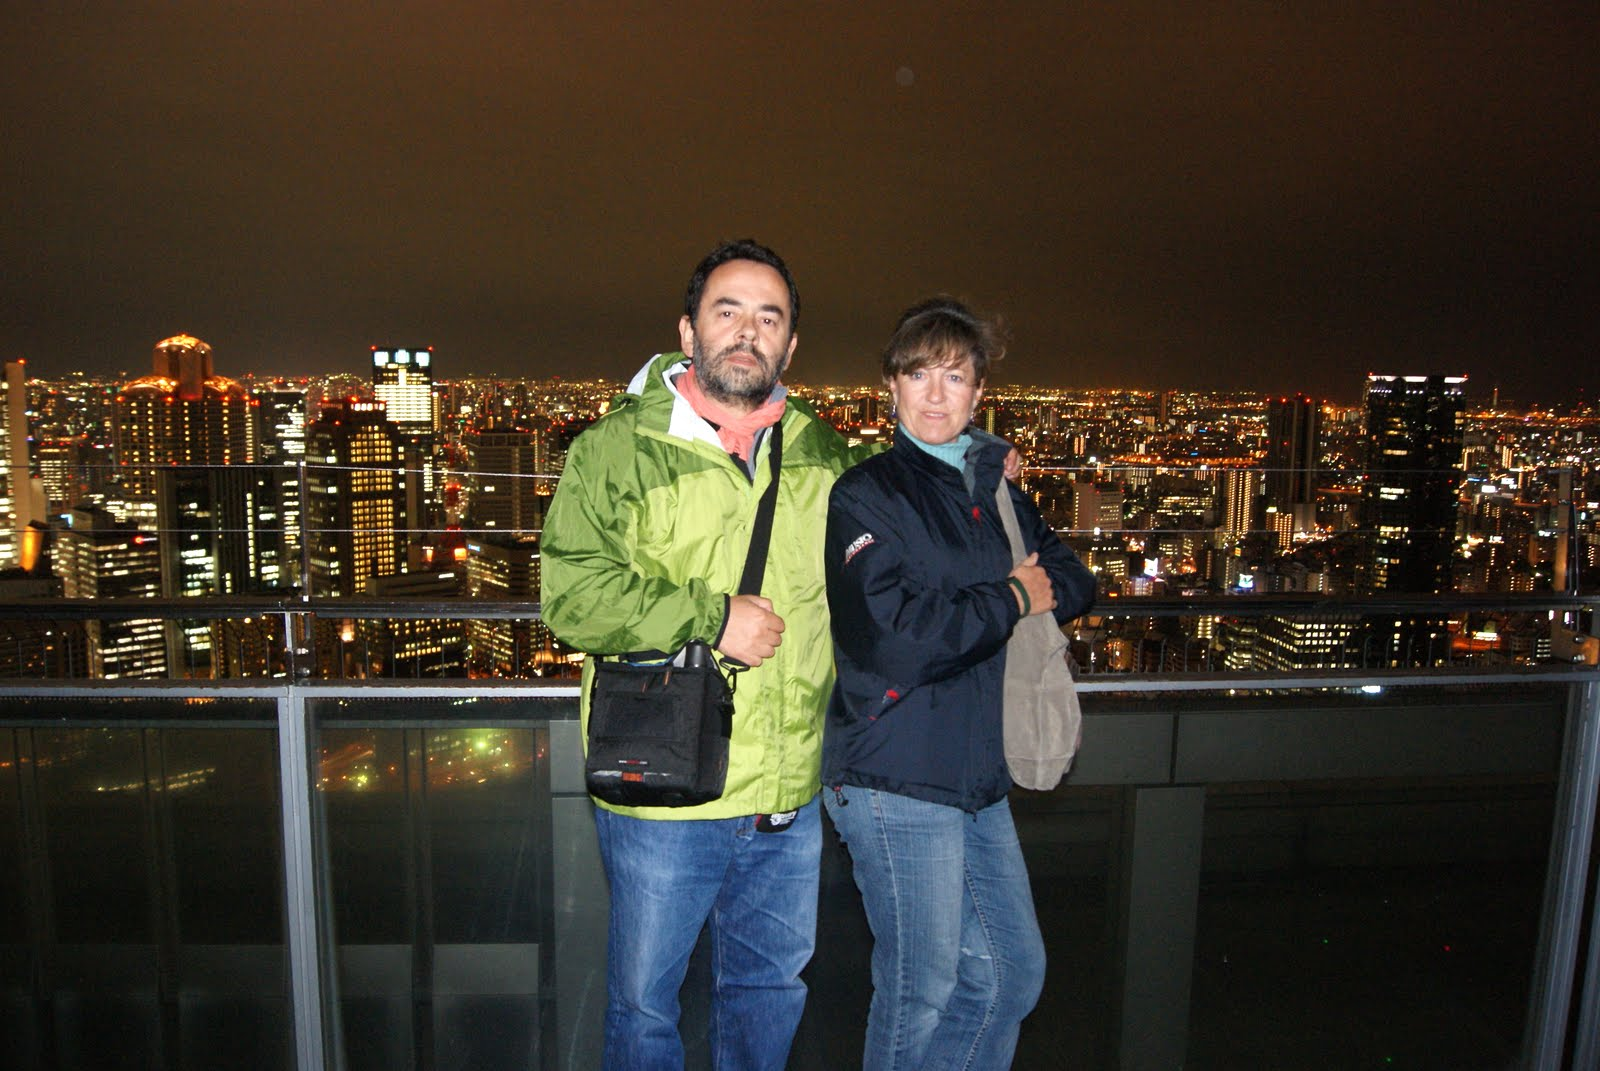 kumano kodo y viaje a jap n oto o 2010 nara y osaka On adolfo dominguez kyoto